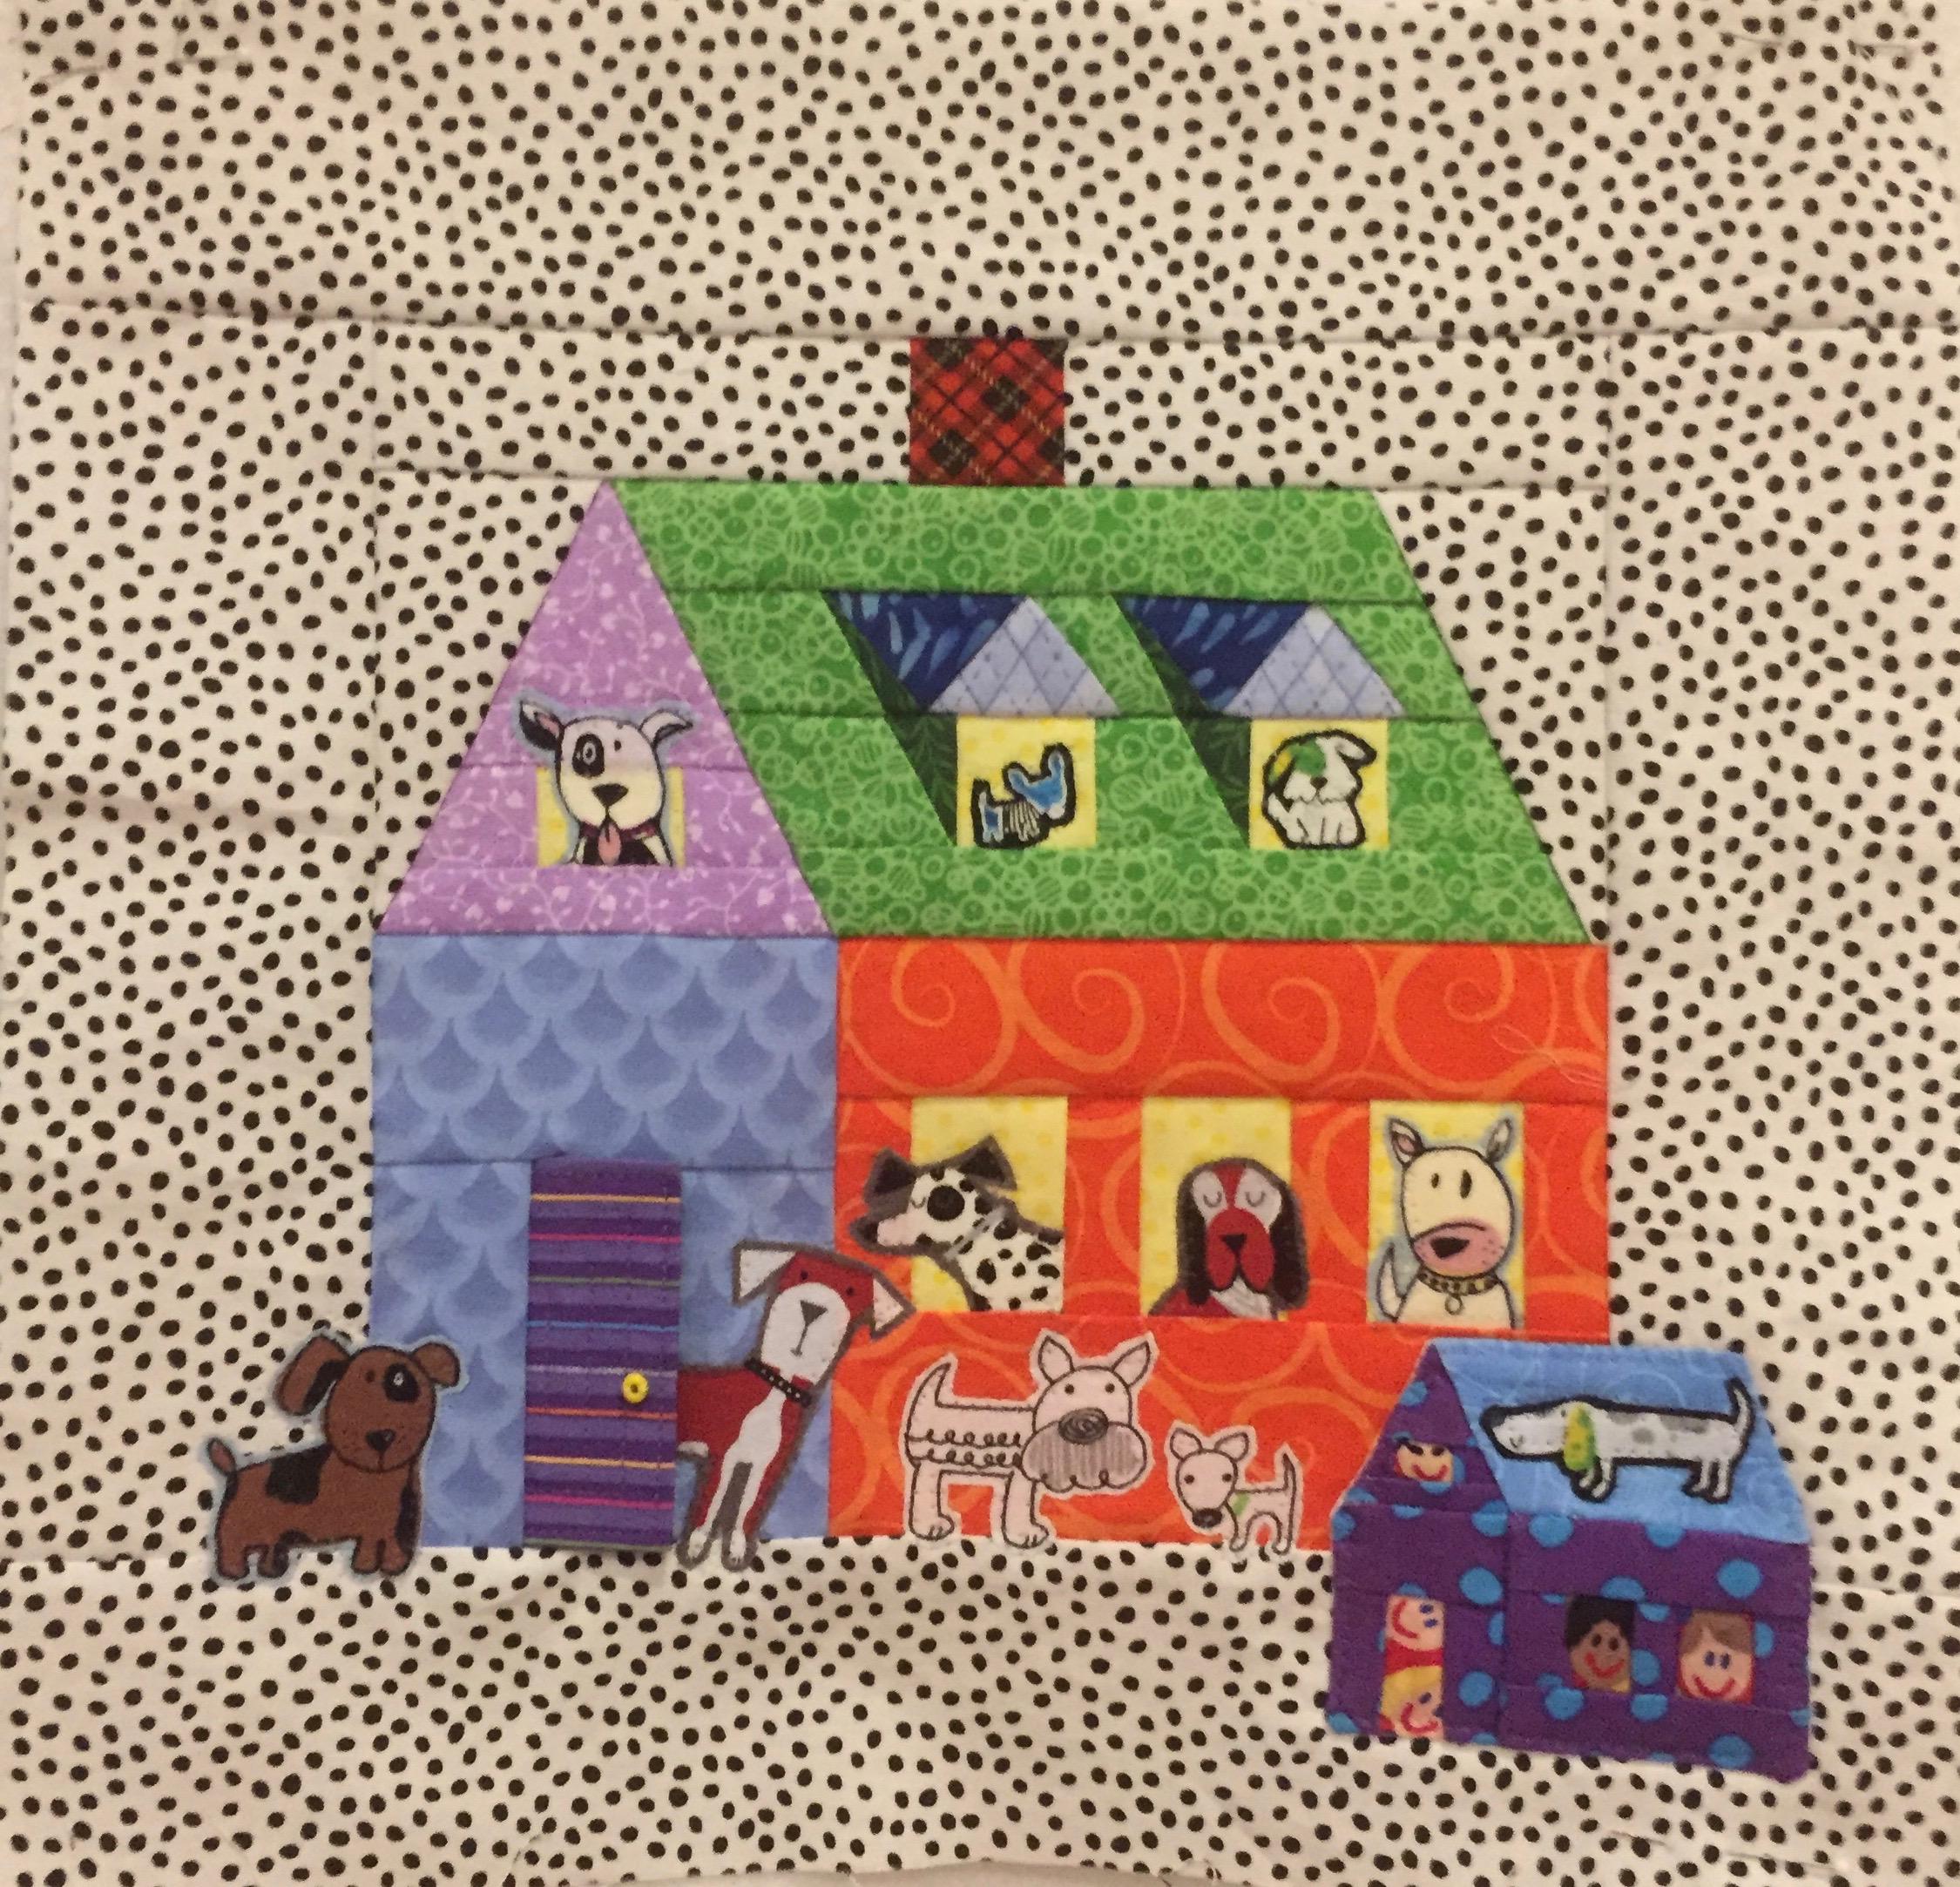 Dog House T Curran.jpg